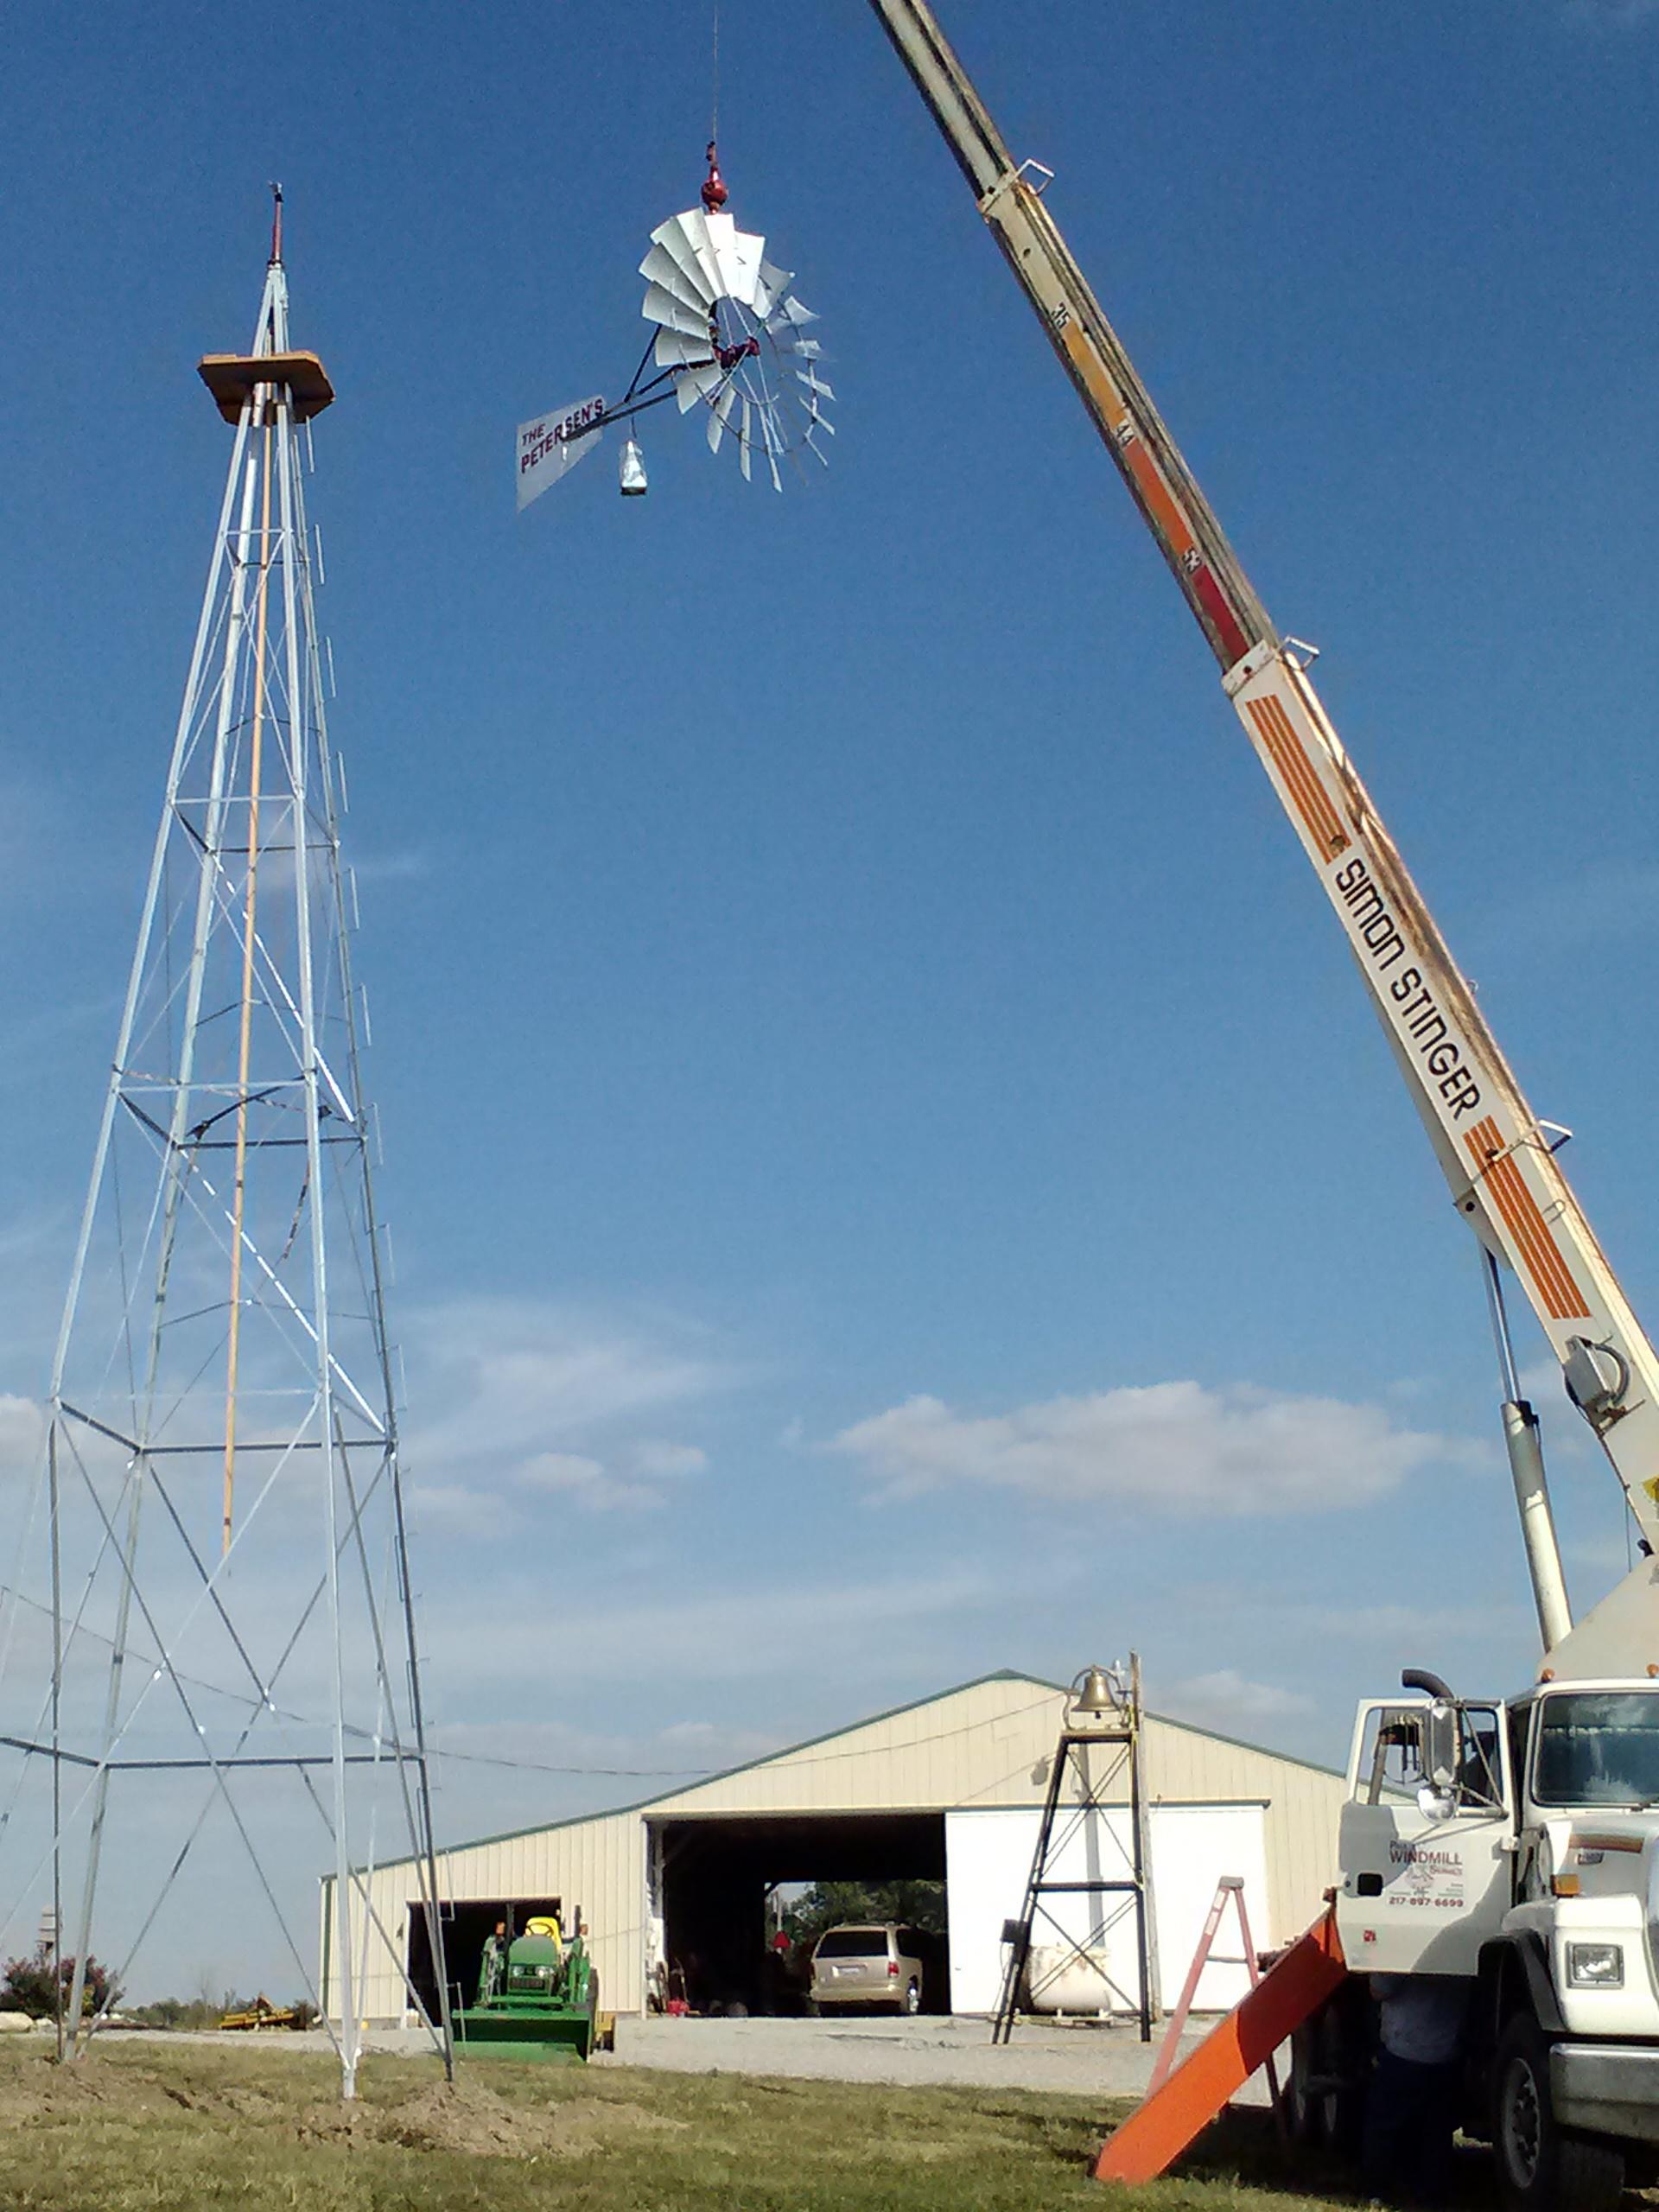 Beautiful Fall day to install a new windmill!